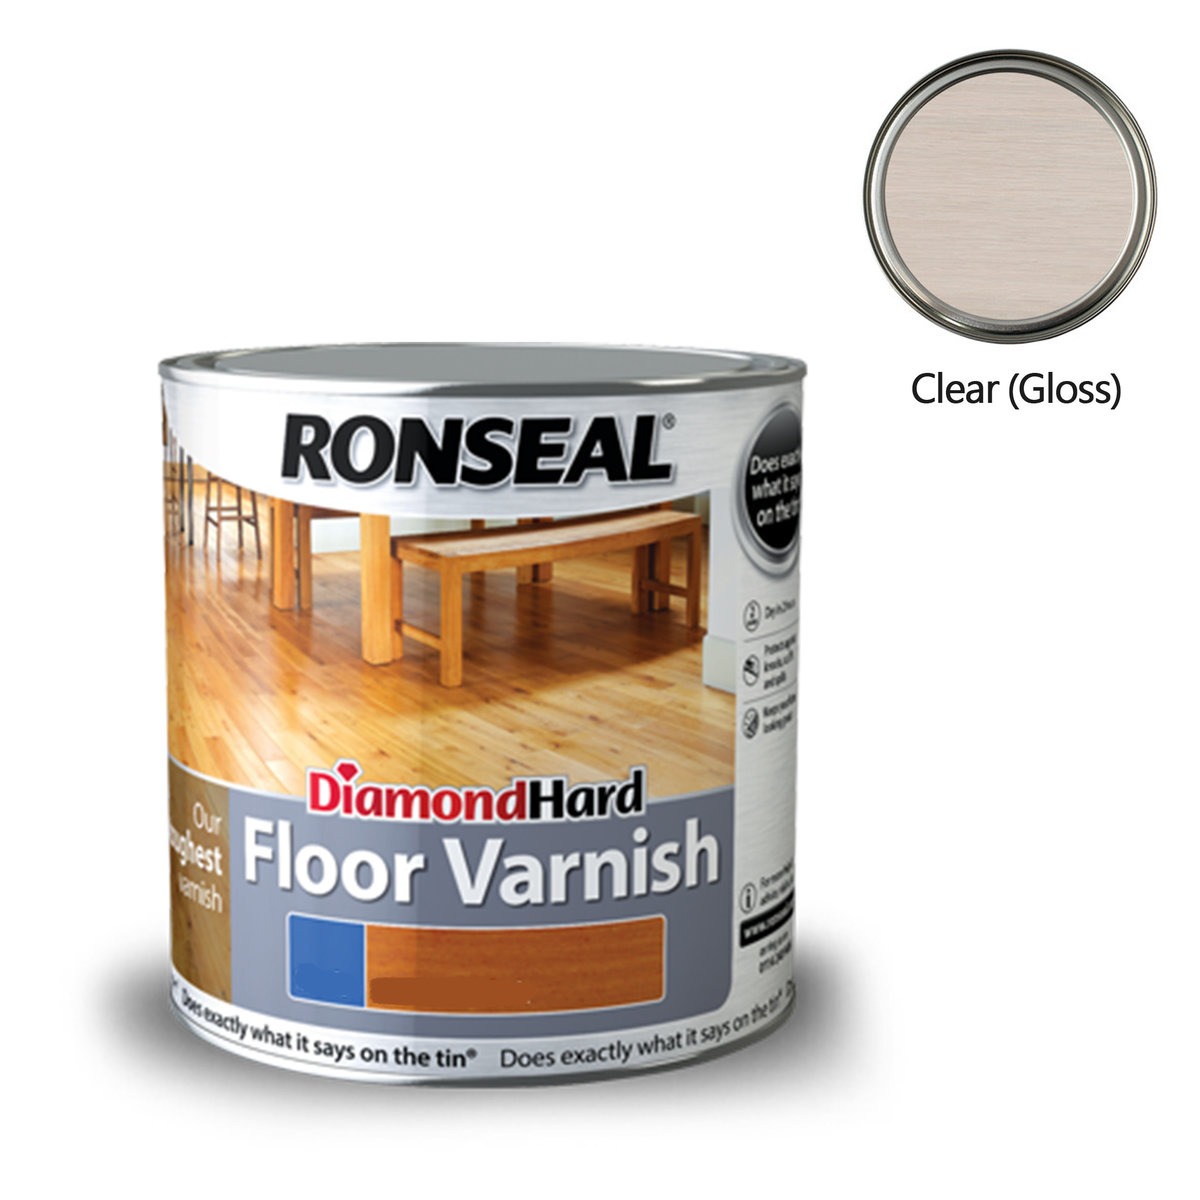 Ronseal Diamond Hard Floor Varnish 2 5l Clear Gloss 32582